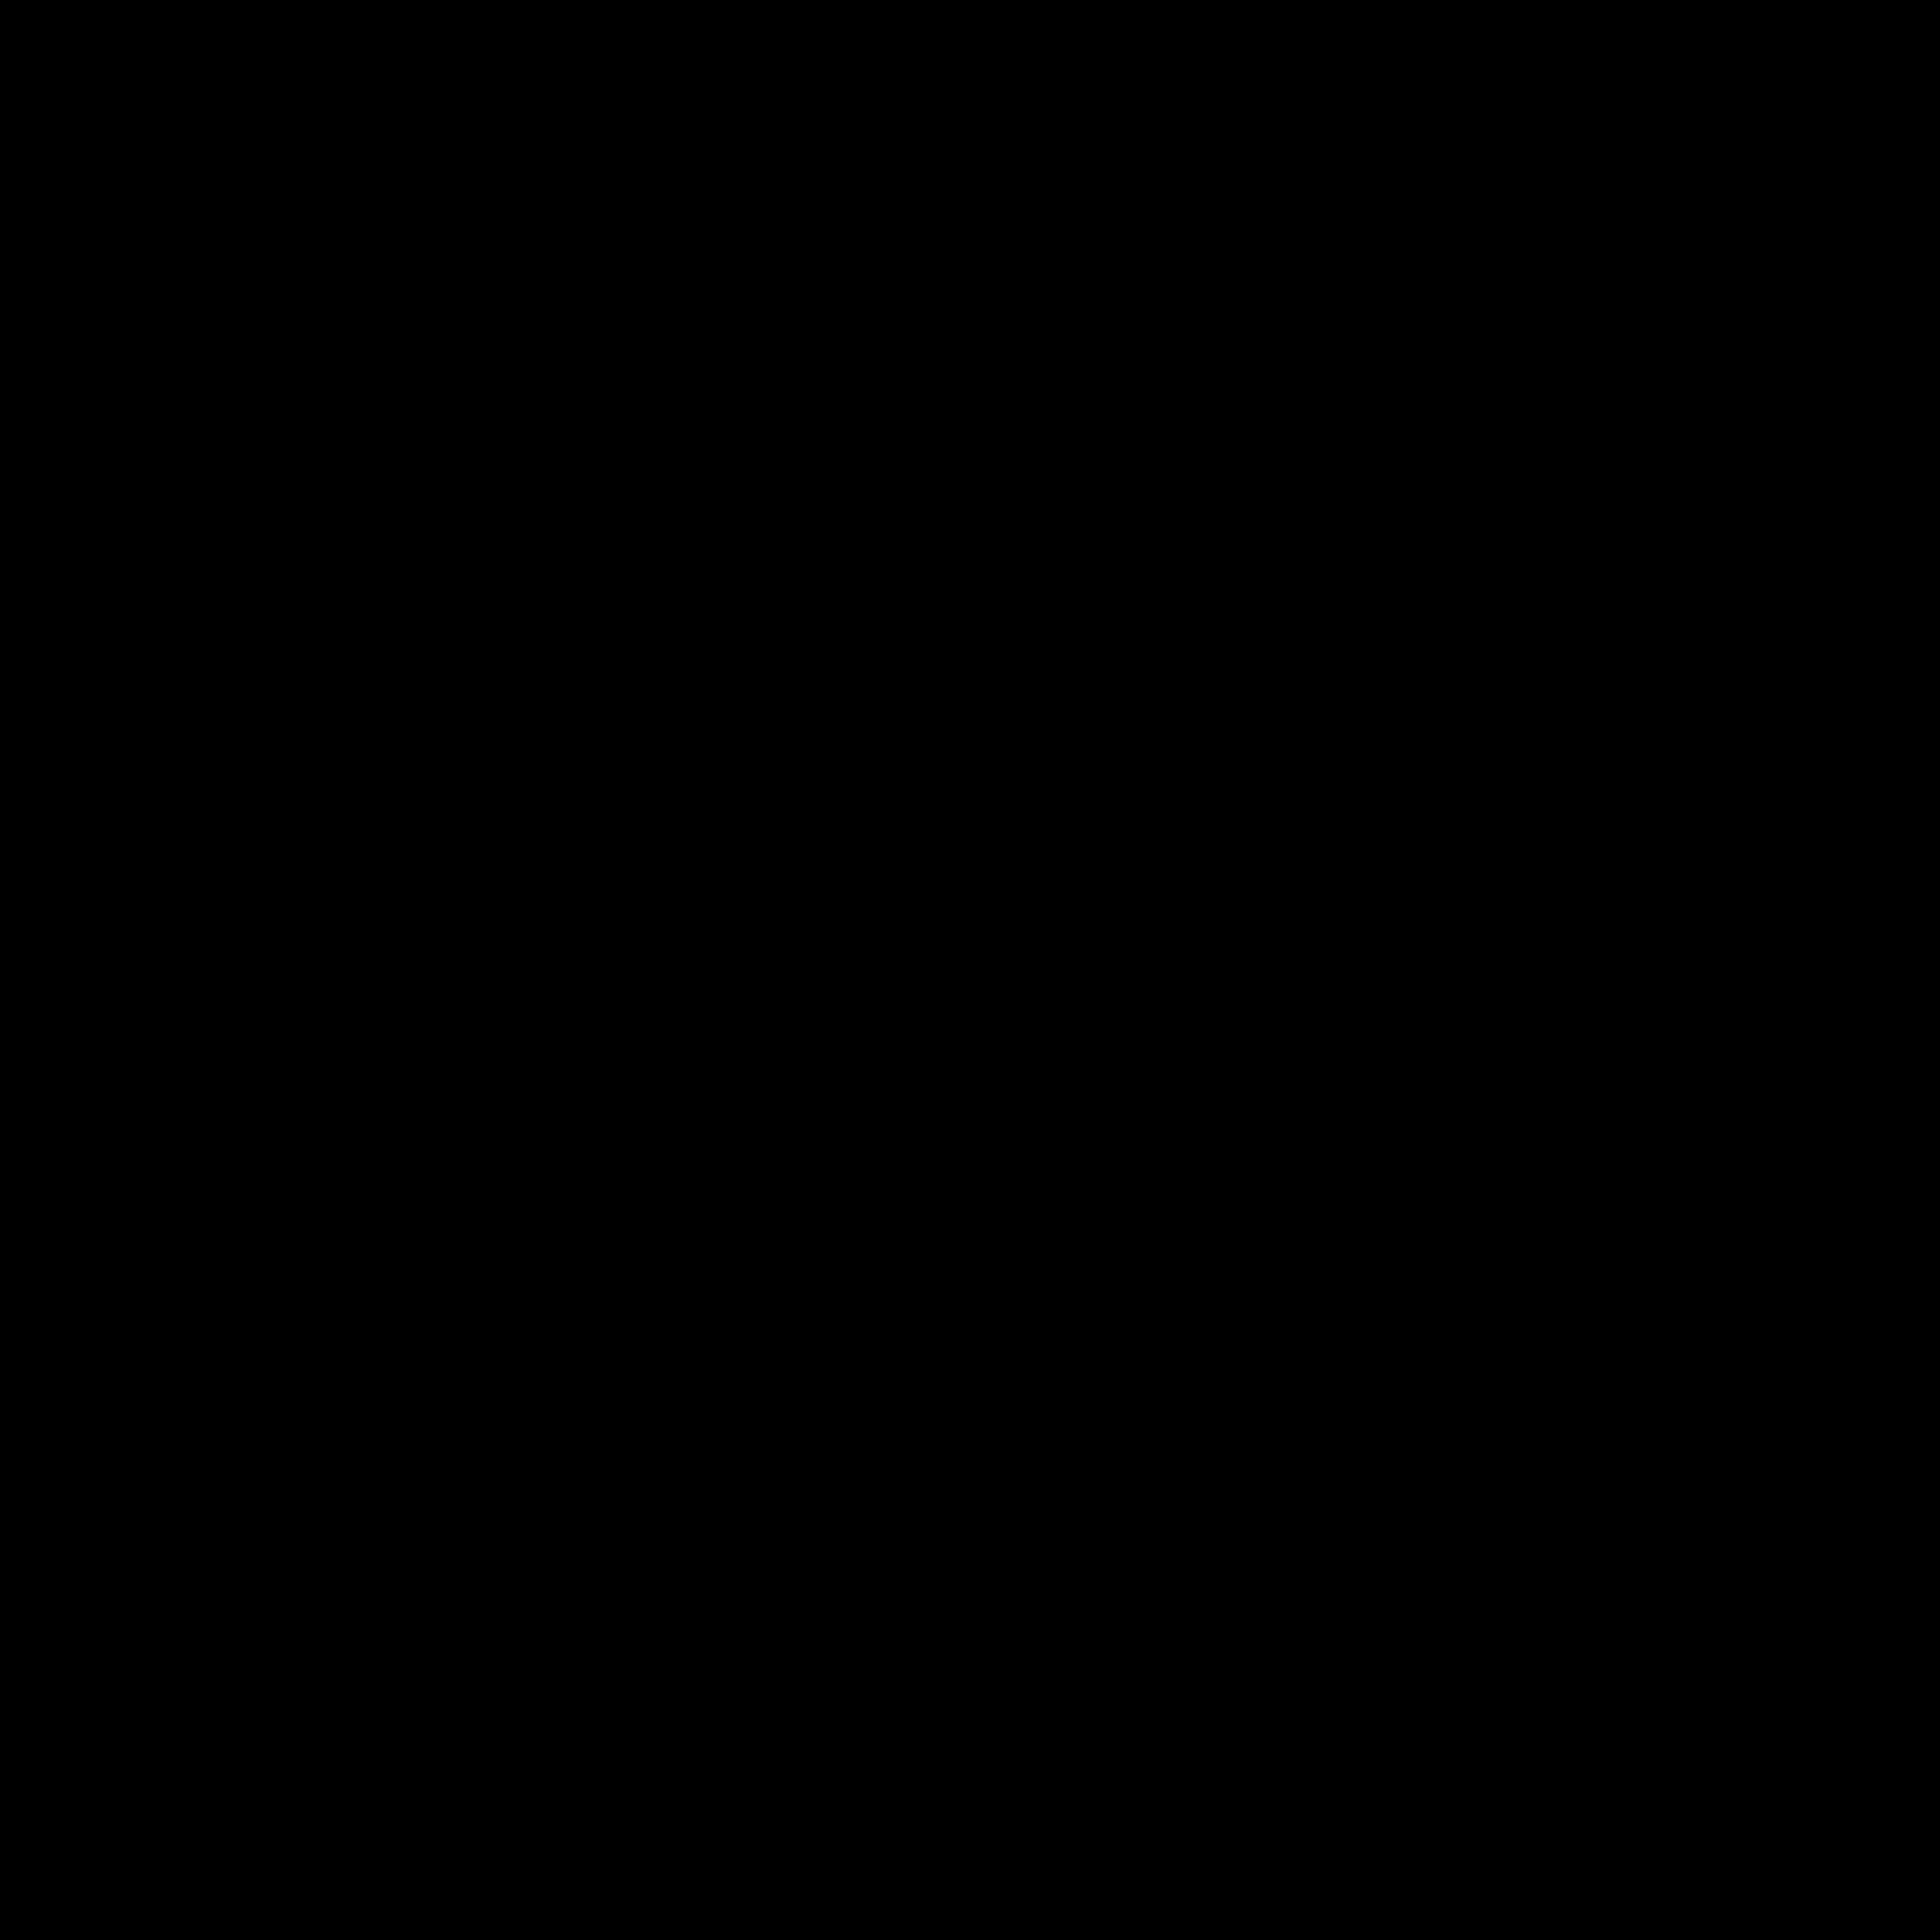 img_7379